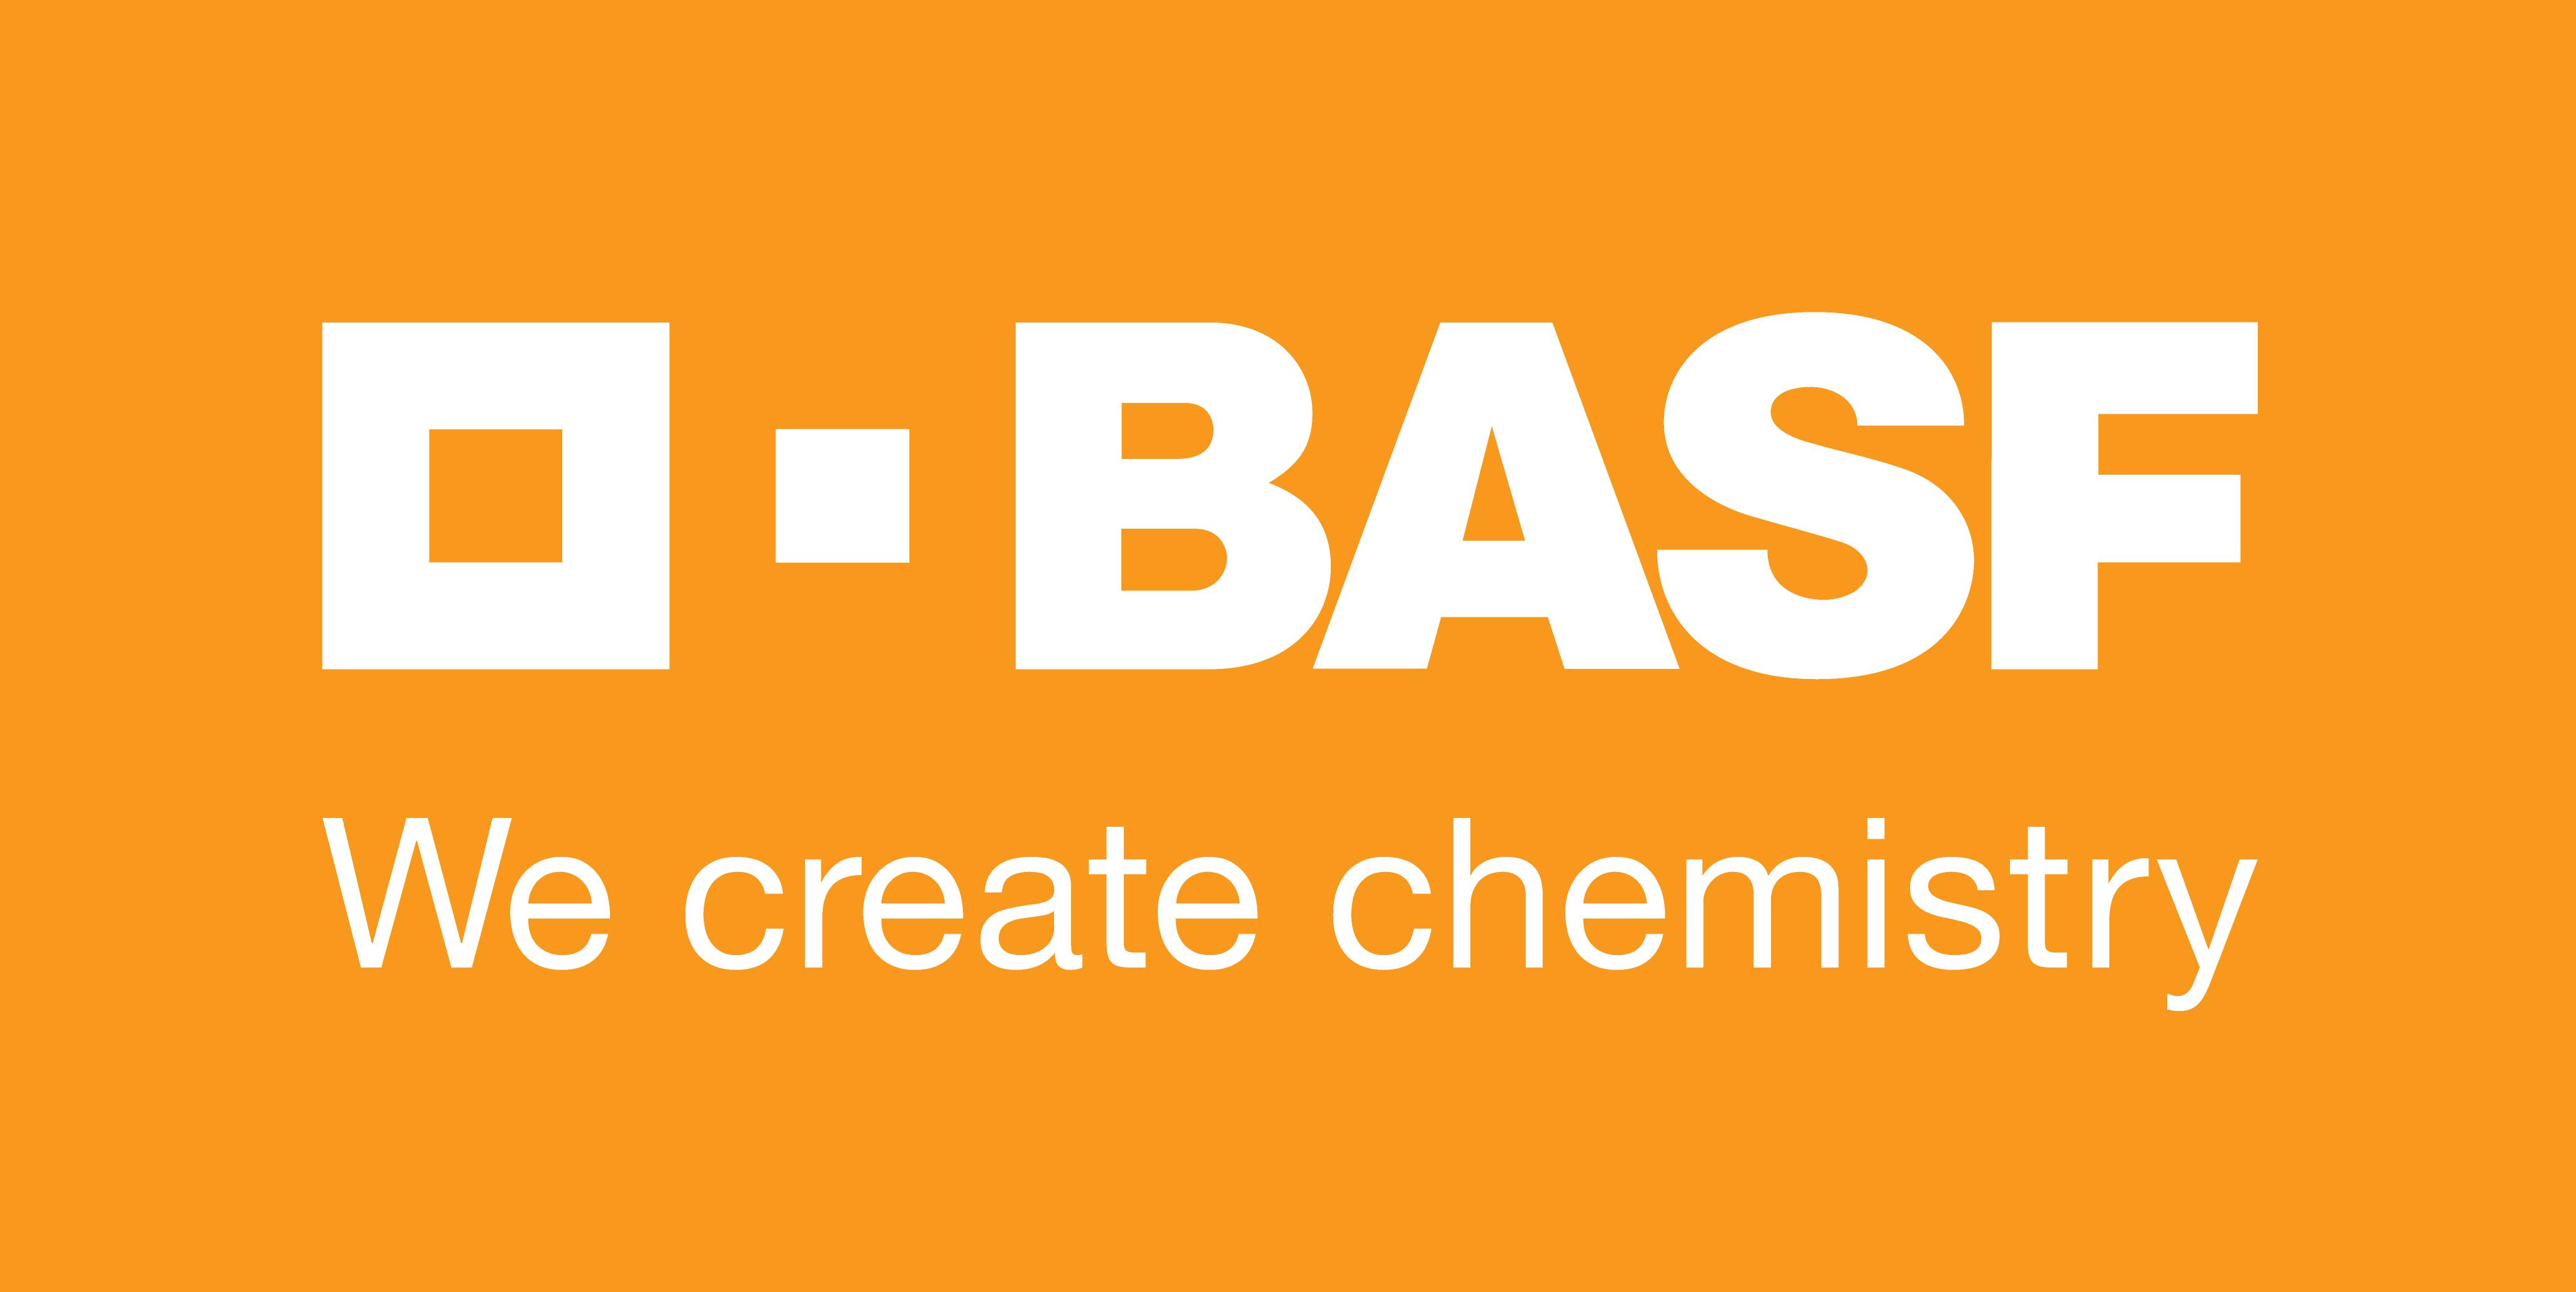 basf logo 9 - BASF Logo